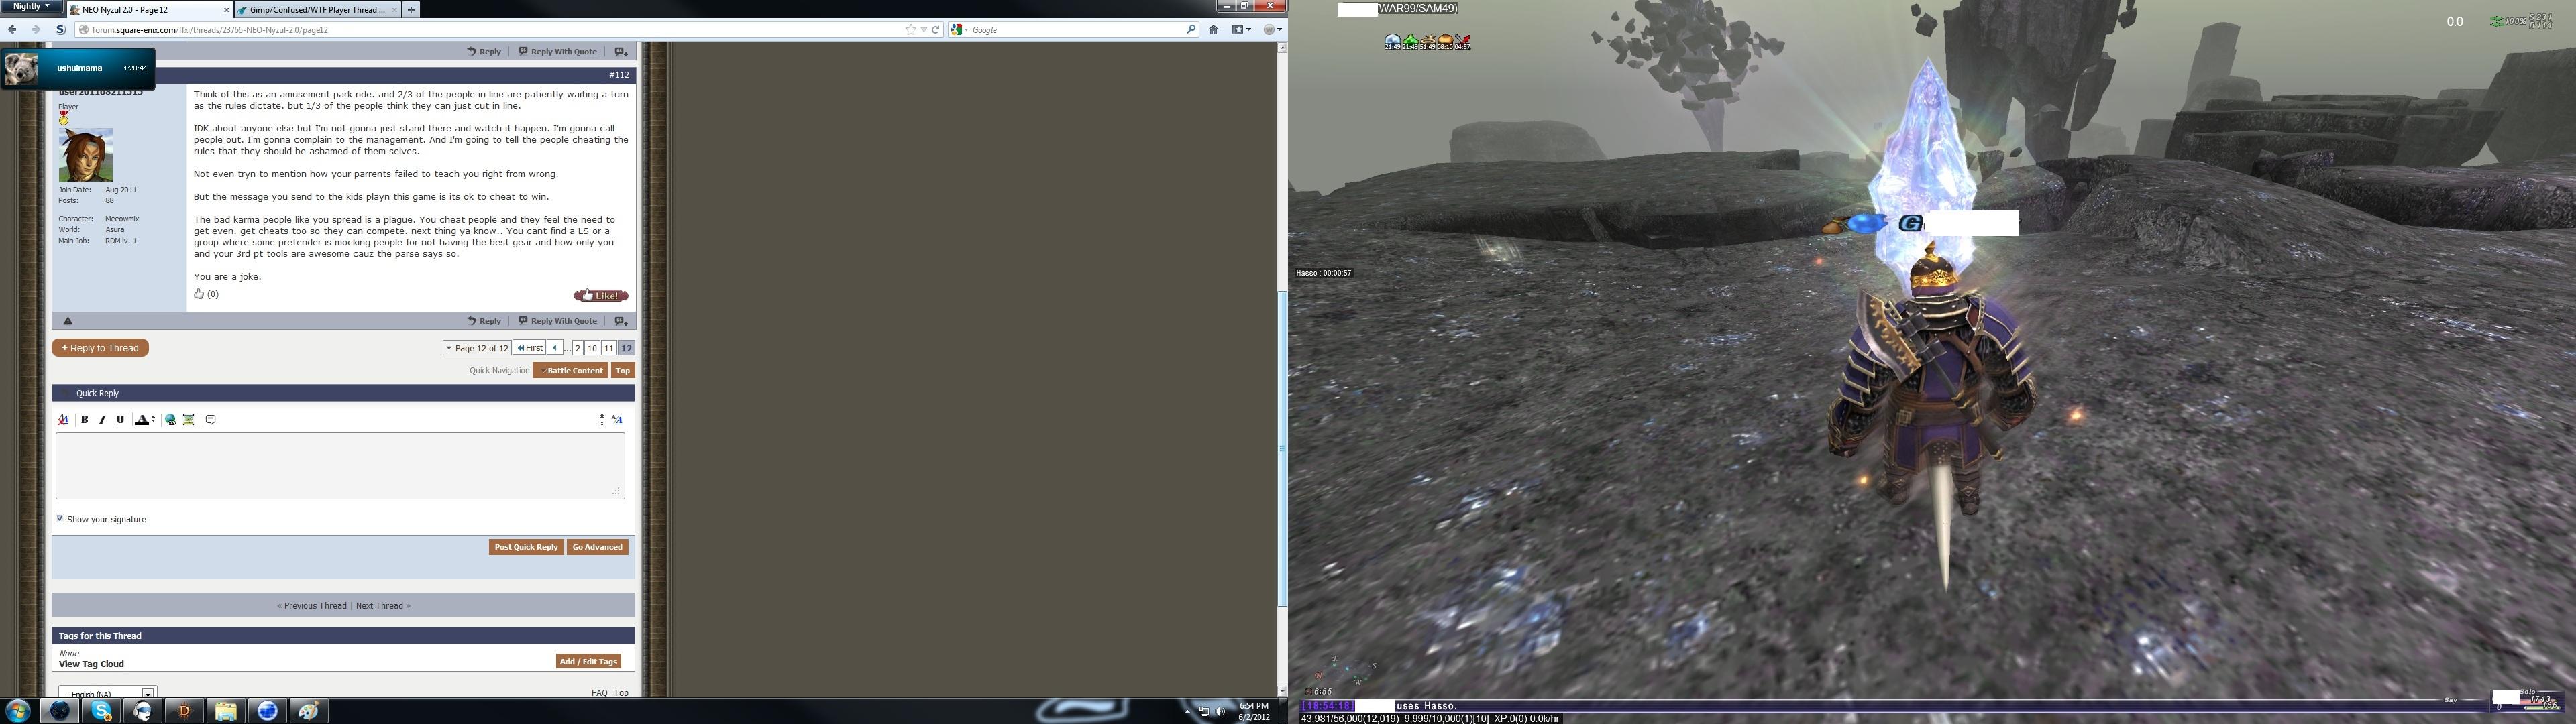 NEO Nyzul 2 0 [Archive] - FINAL FANTASY XI Forum